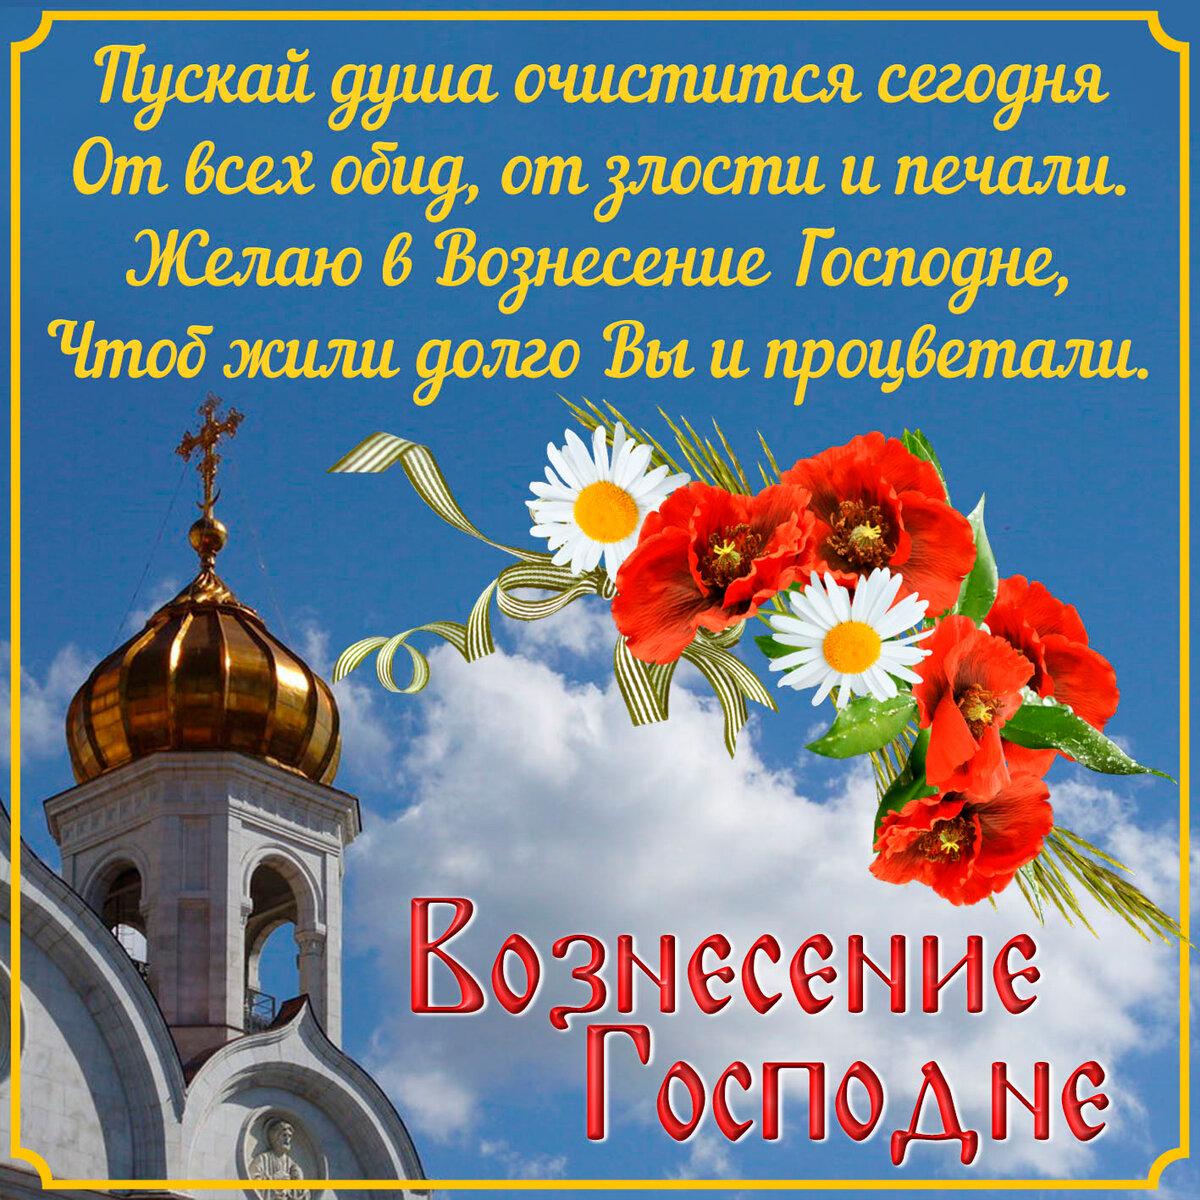 Праздники сегодня православный праздник сегодня поздравления